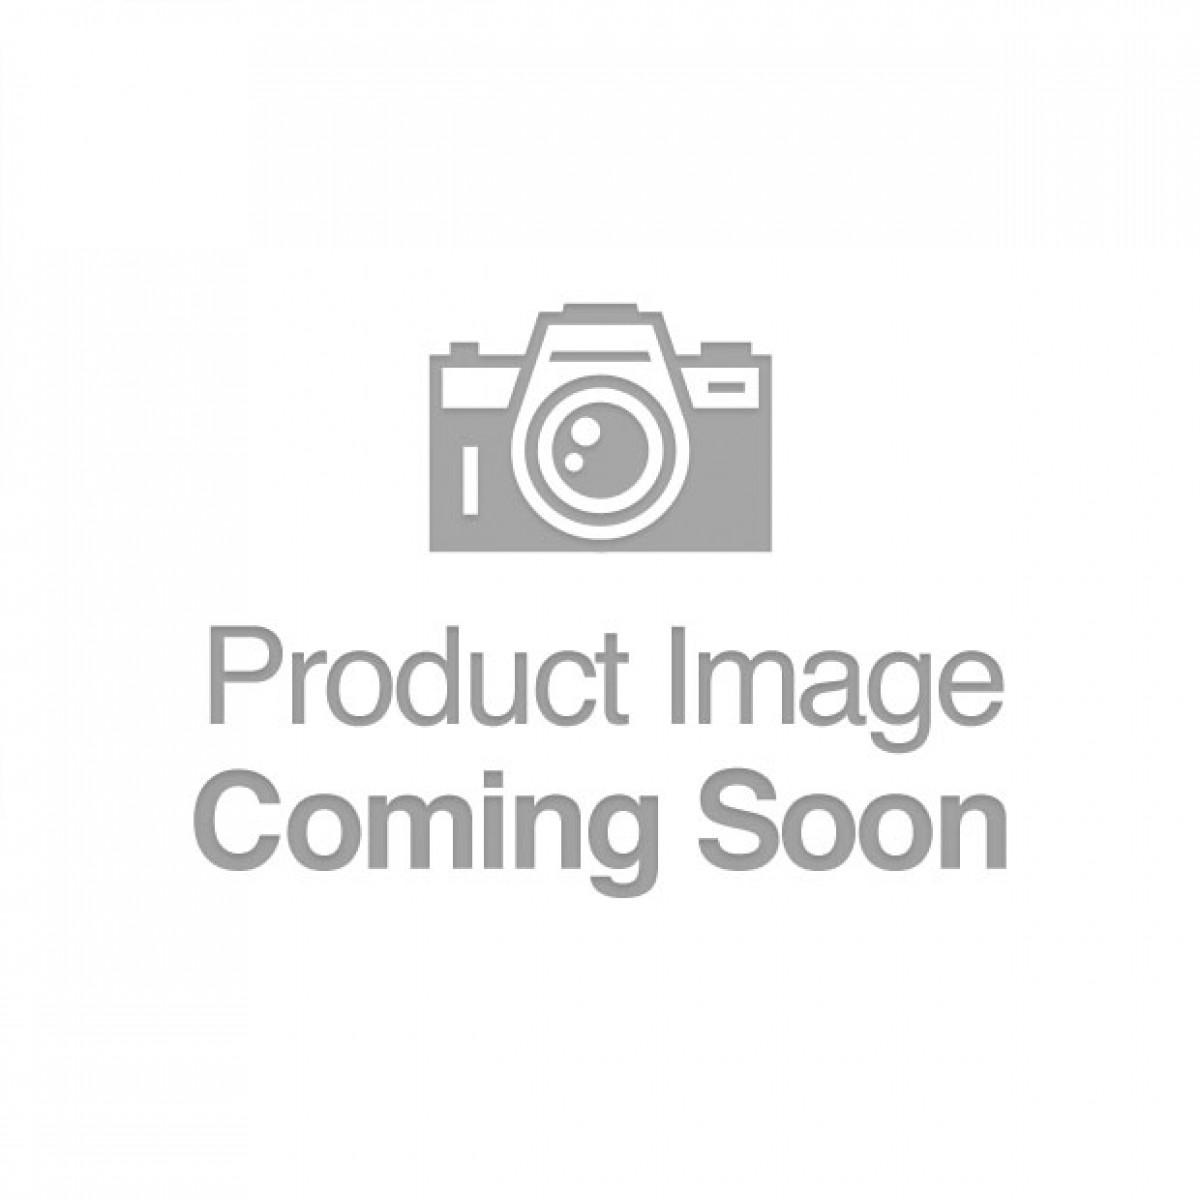 Skinsations Duplexx Vibrating & Rotating Double Dildo - Flesh